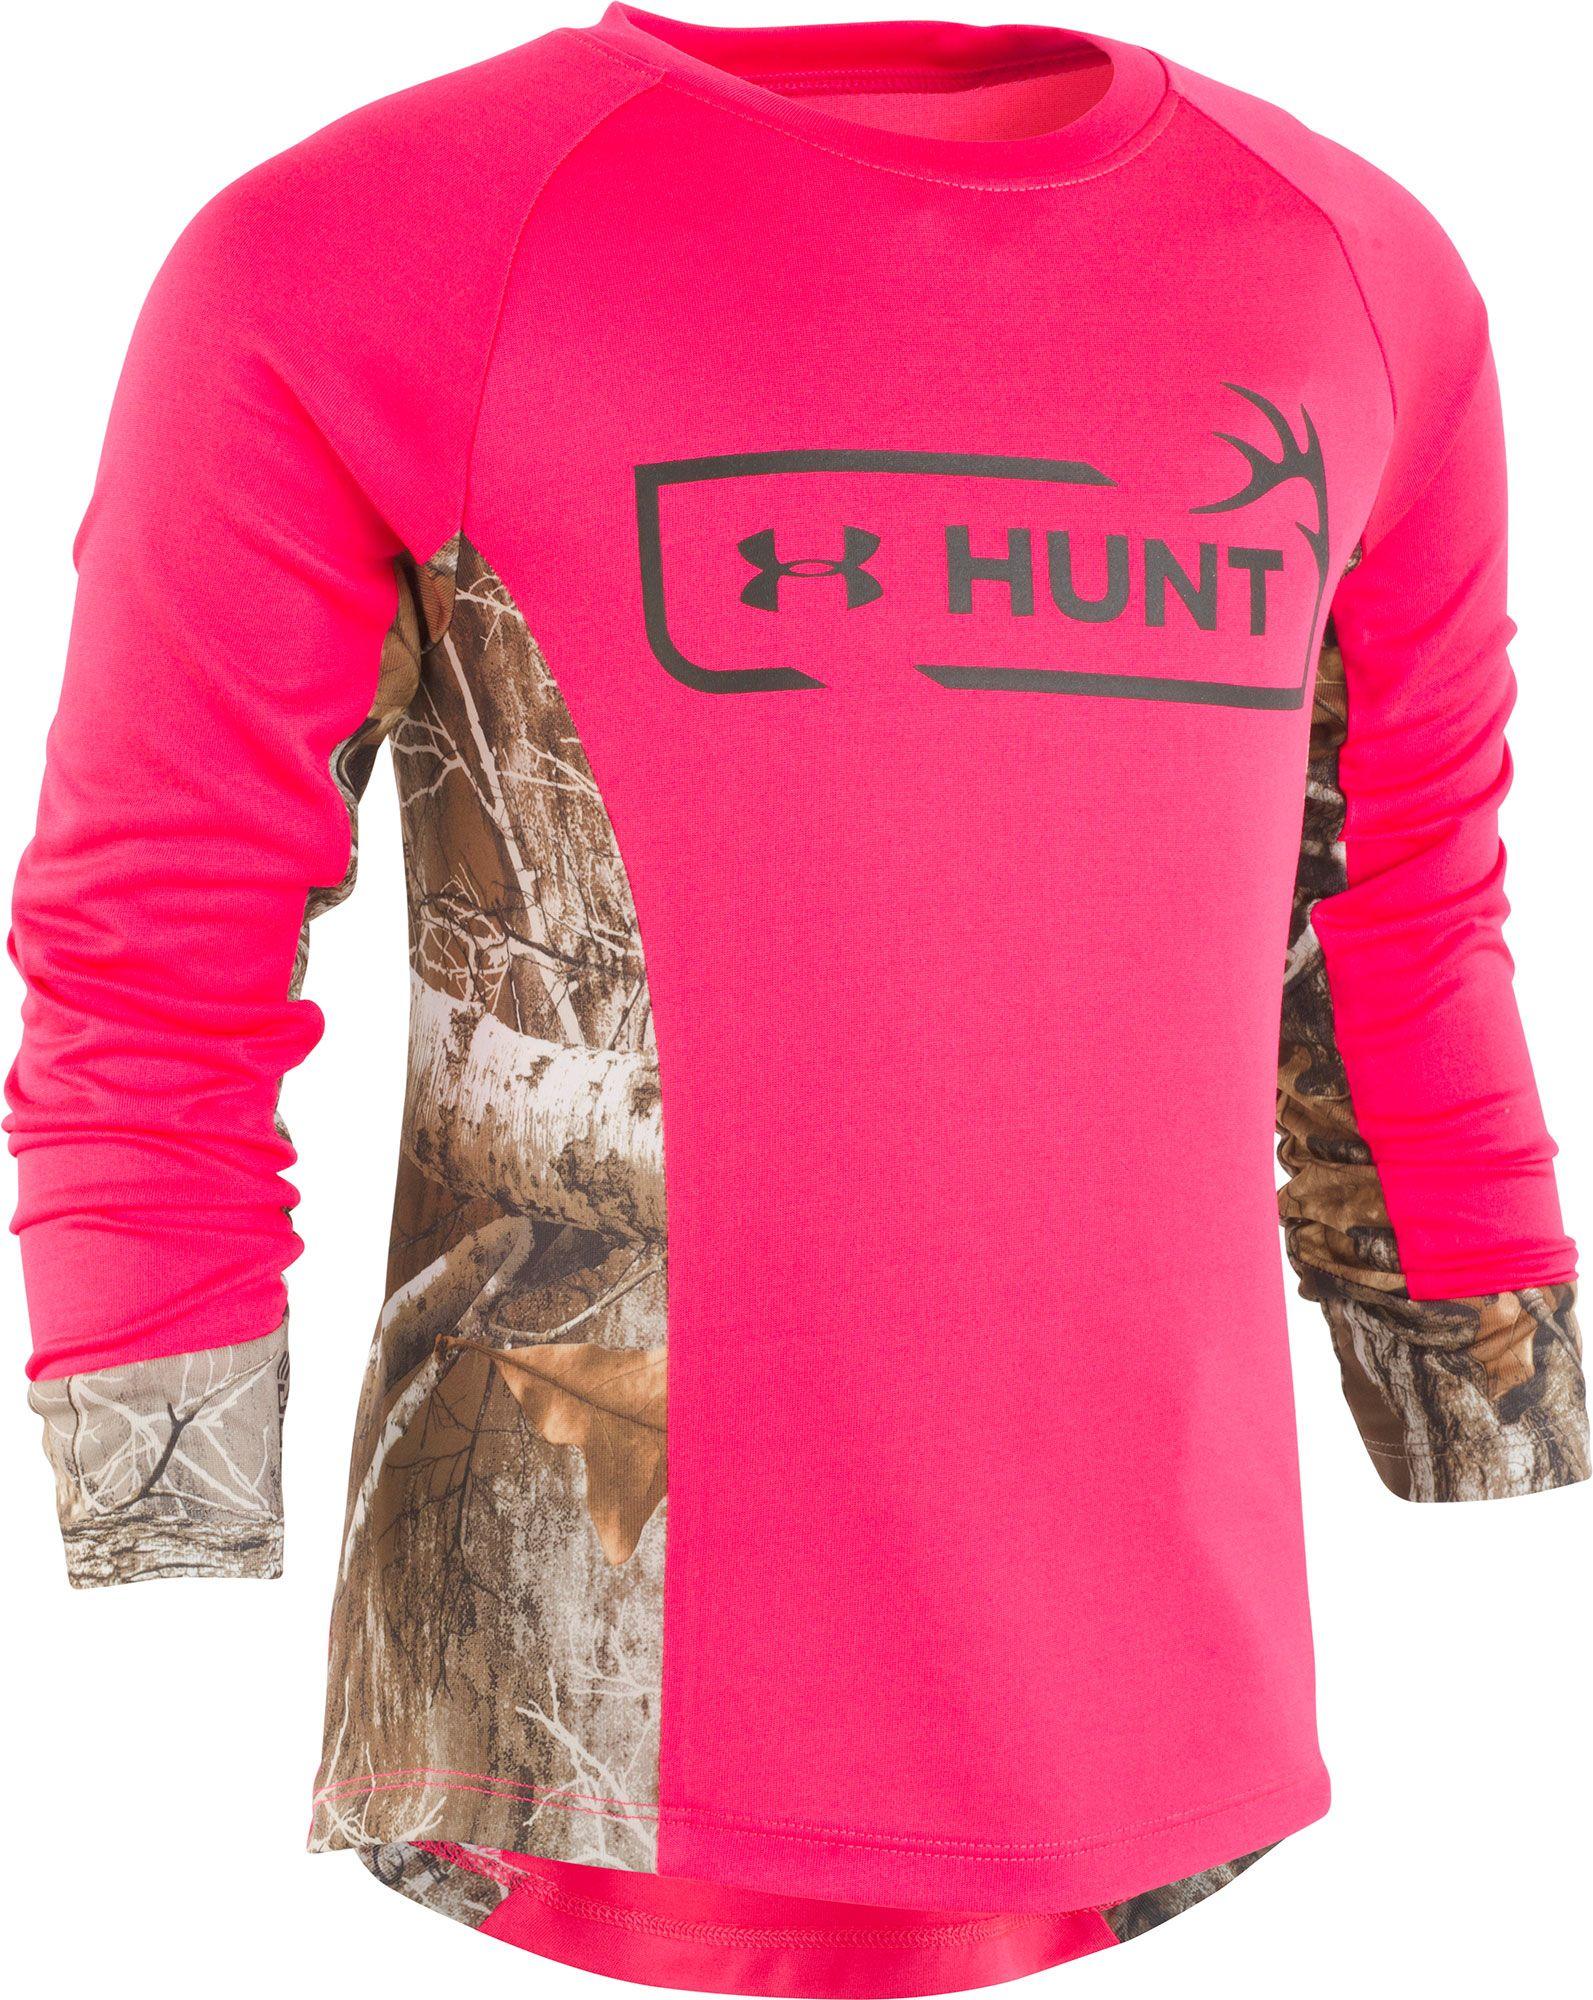 Under Armour Toddler Girls' Hunt Logo Long Sleeve Shirt, Girl's, Size: 3T, Penta Pink thumbnail